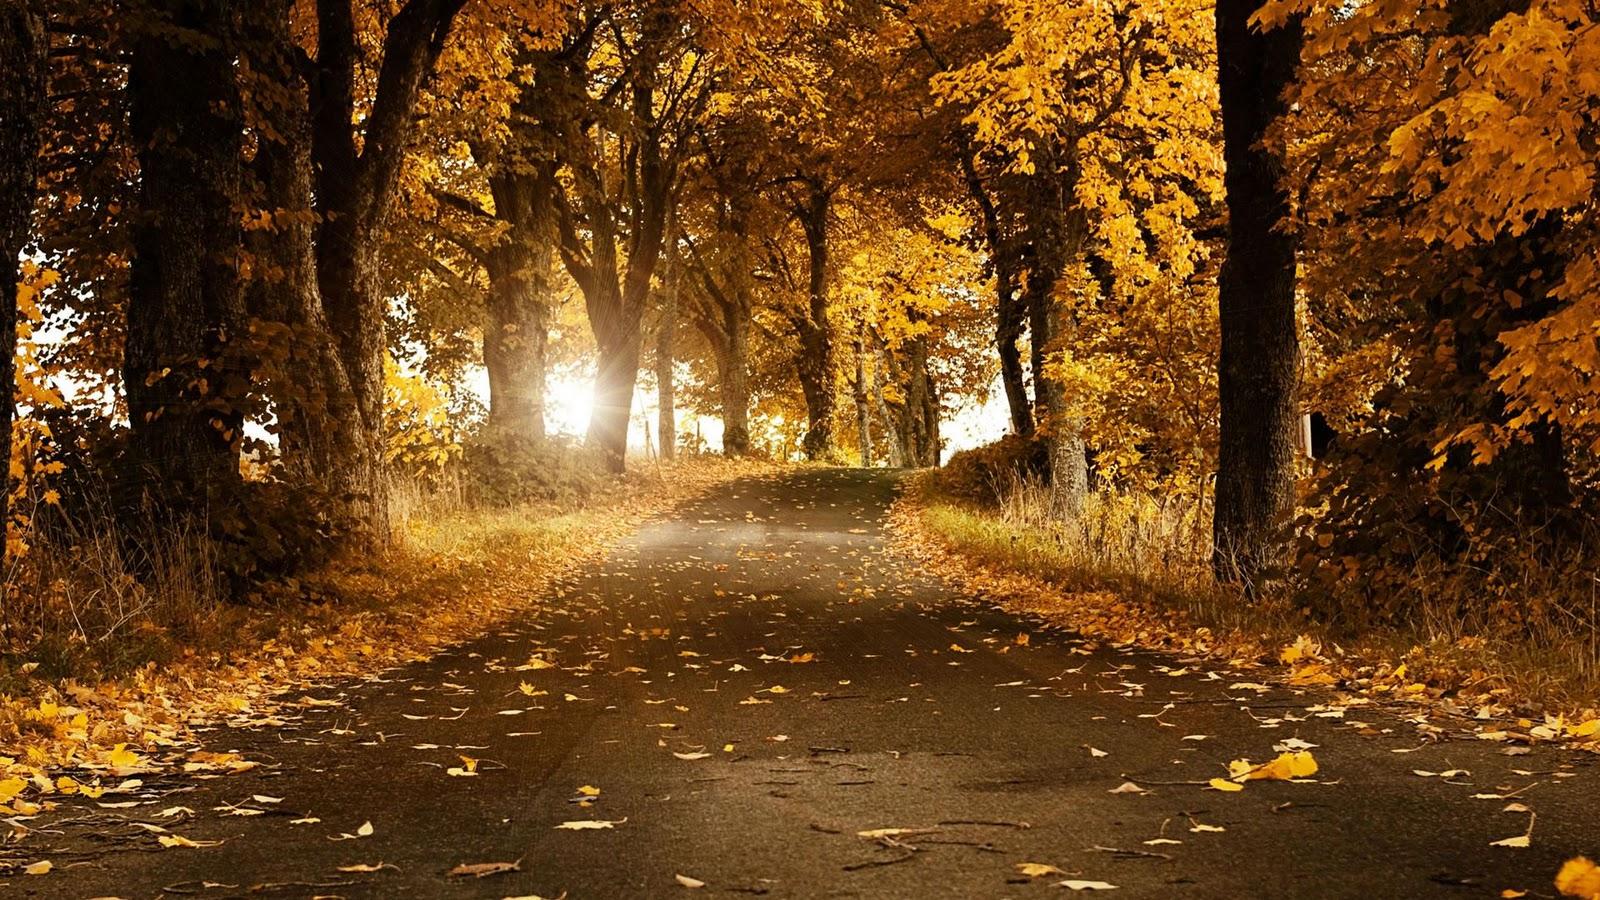 http://2.bp.blogspot.com/_UuCztOmHzkY/TTmY5EhyPrI/AAAAAAAAAAg/x9bzGeWFdAU/s1600/beautiful-autumn-wallpaper-1920x1080-1008098.JPG